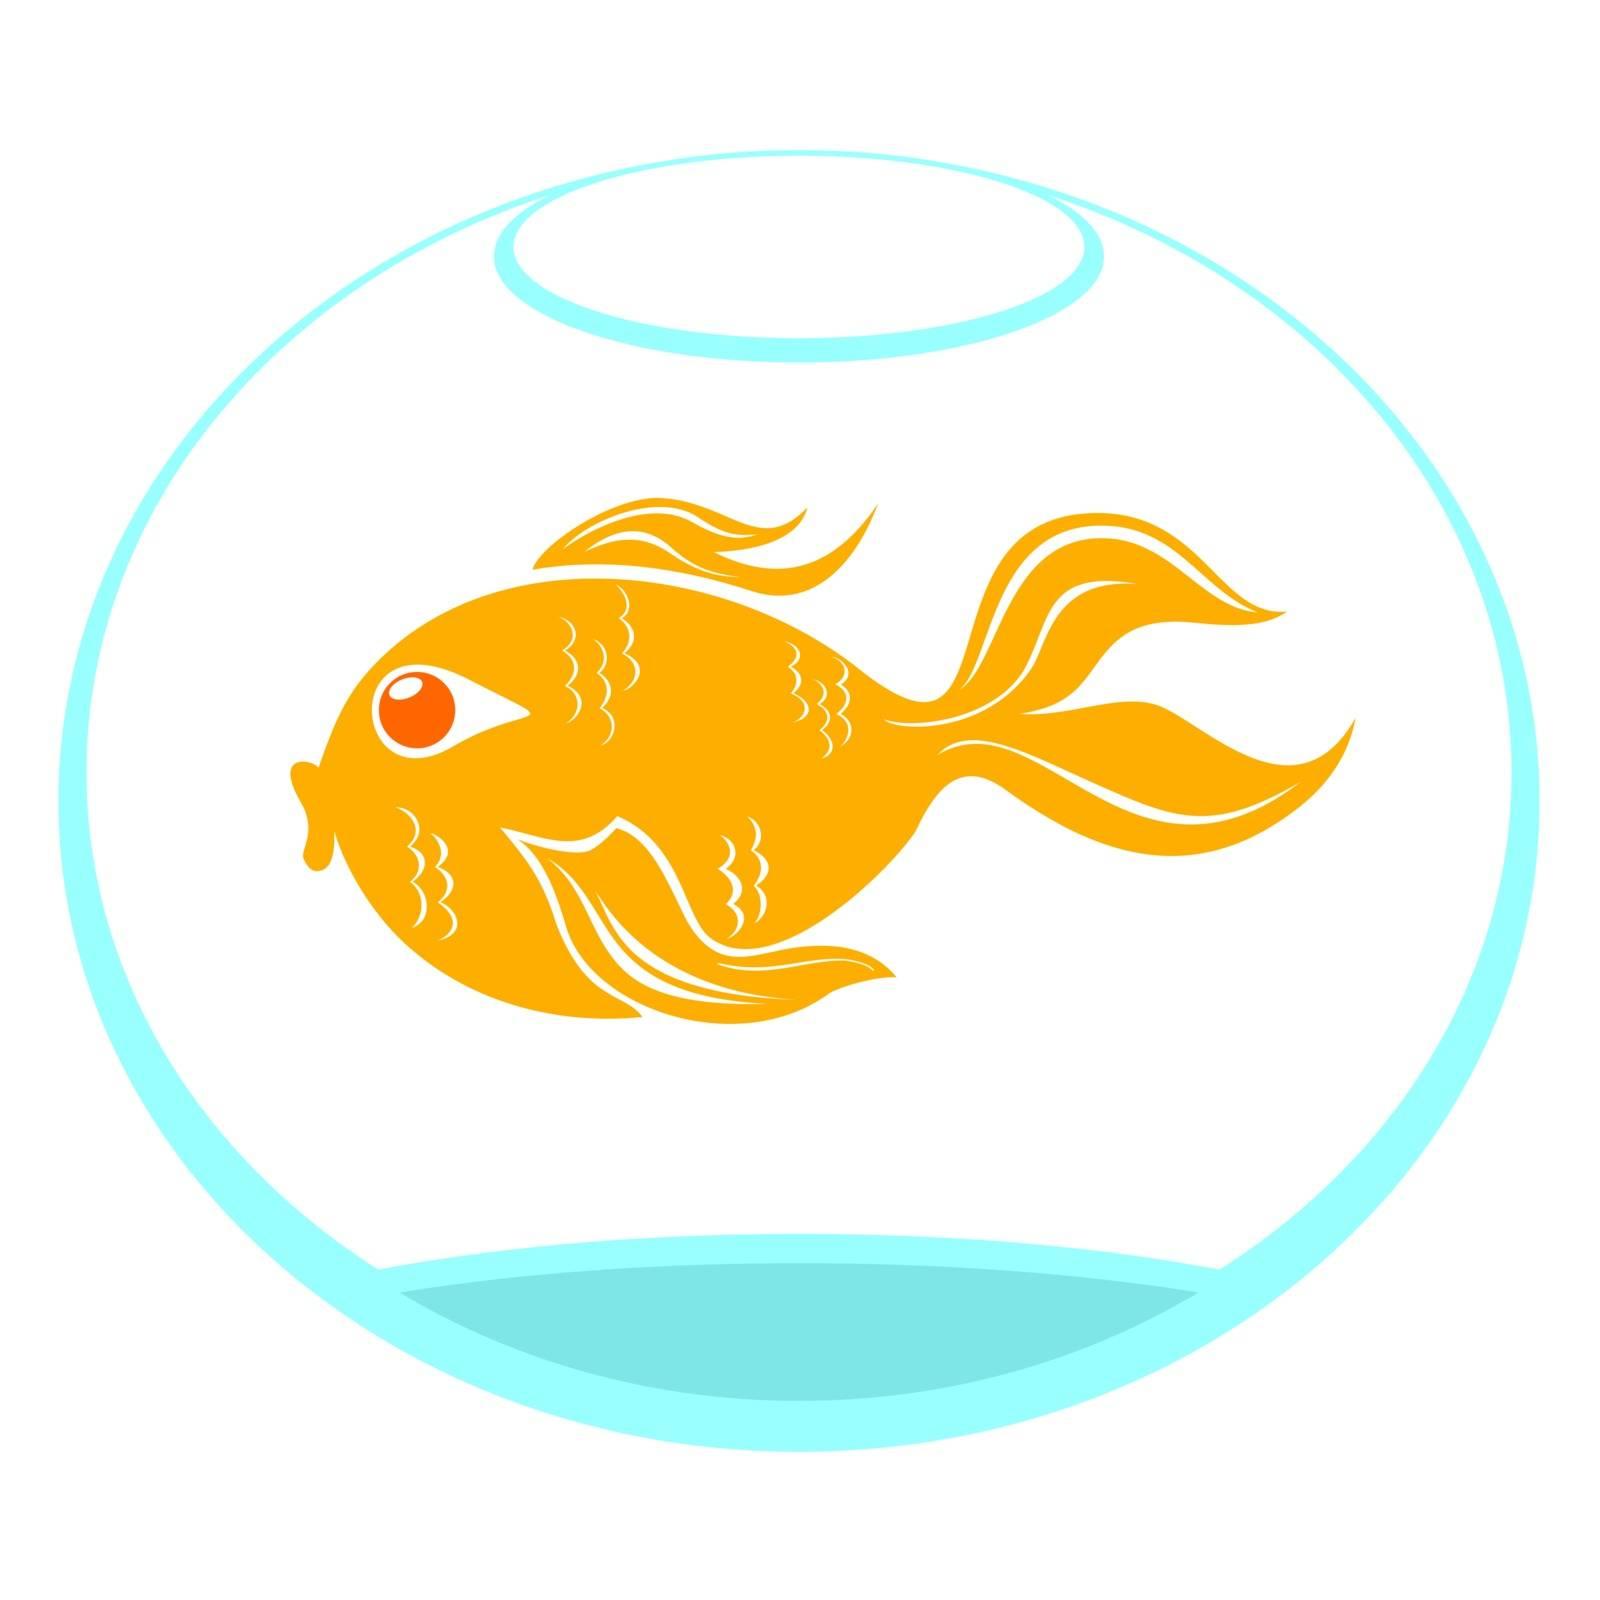 Goldfish symbol by oxygen64